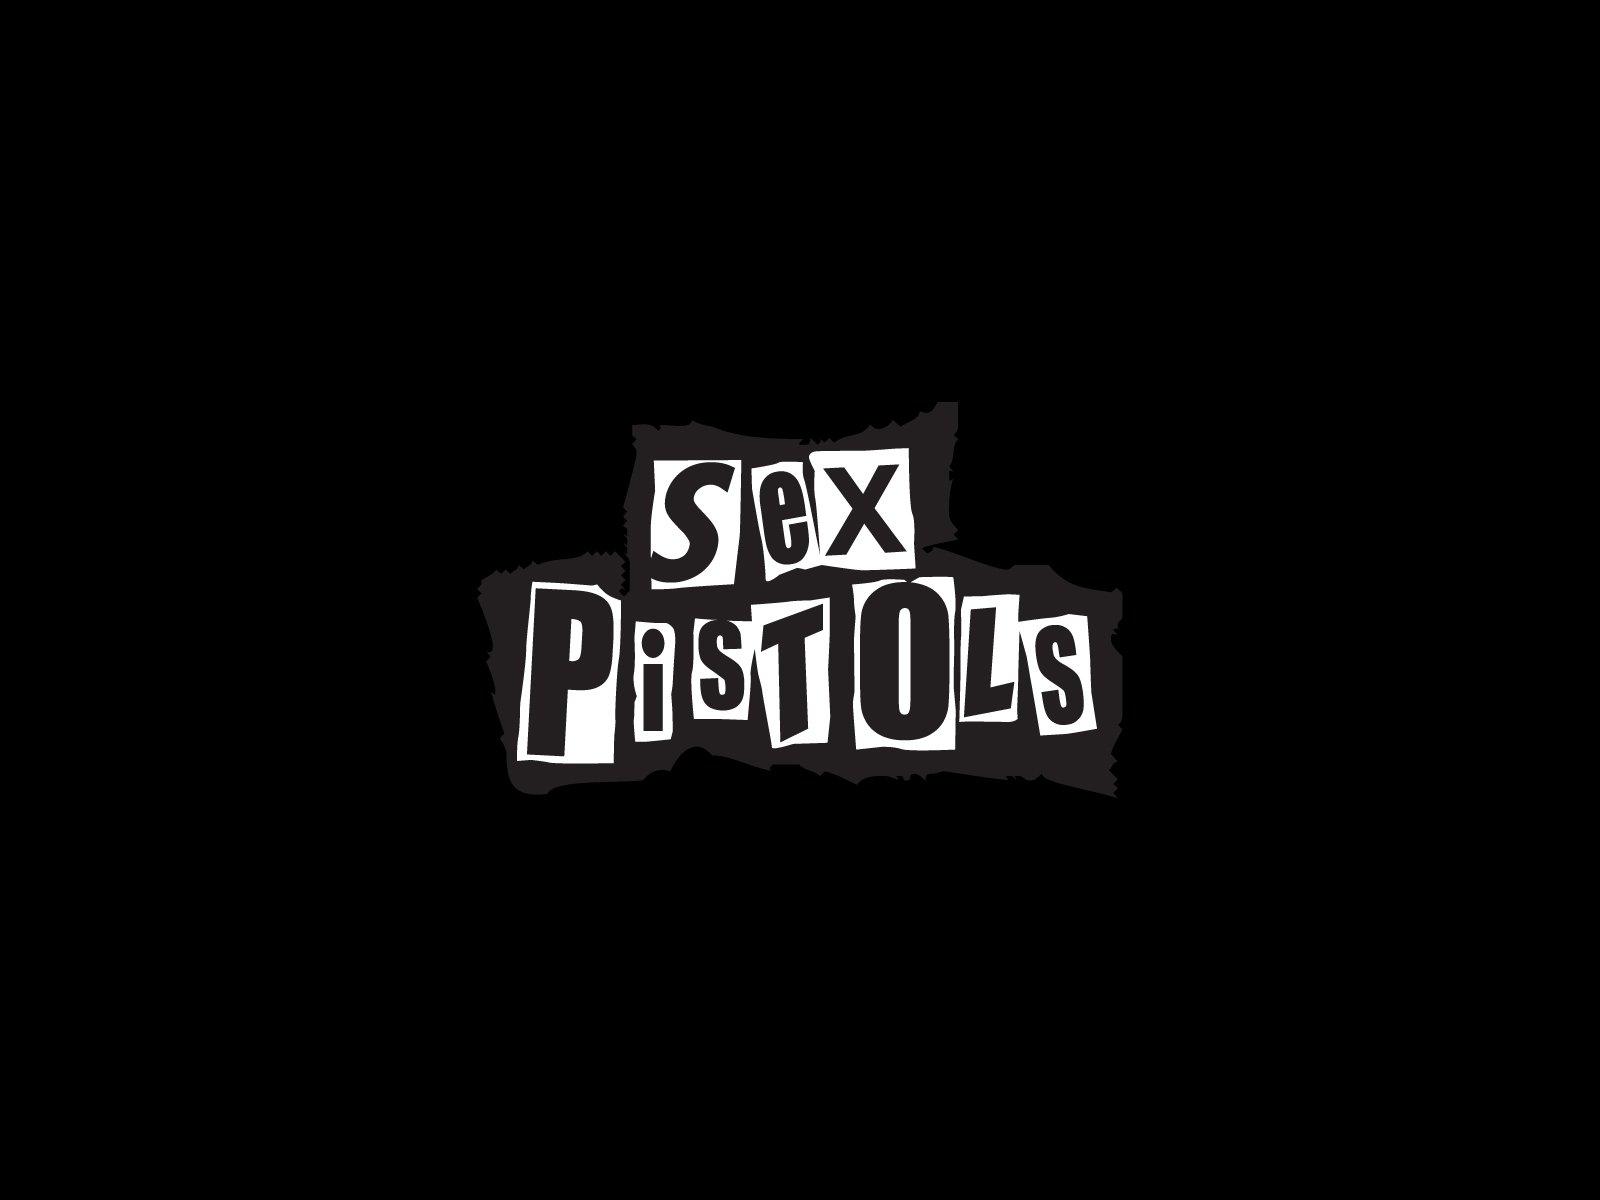 The sex pistols wallpaper